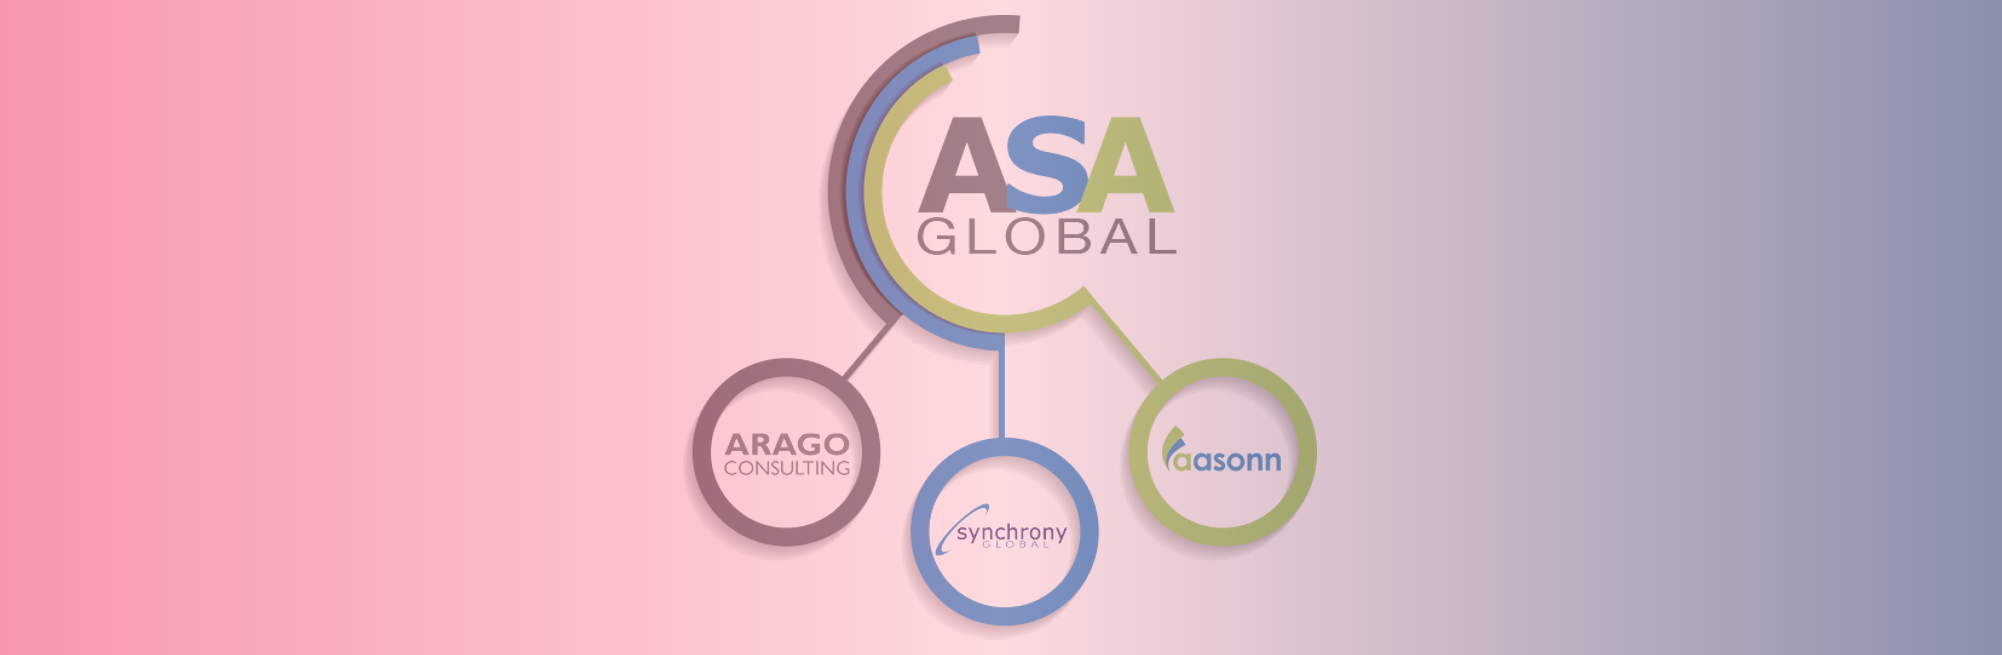 ASA Global Alliance